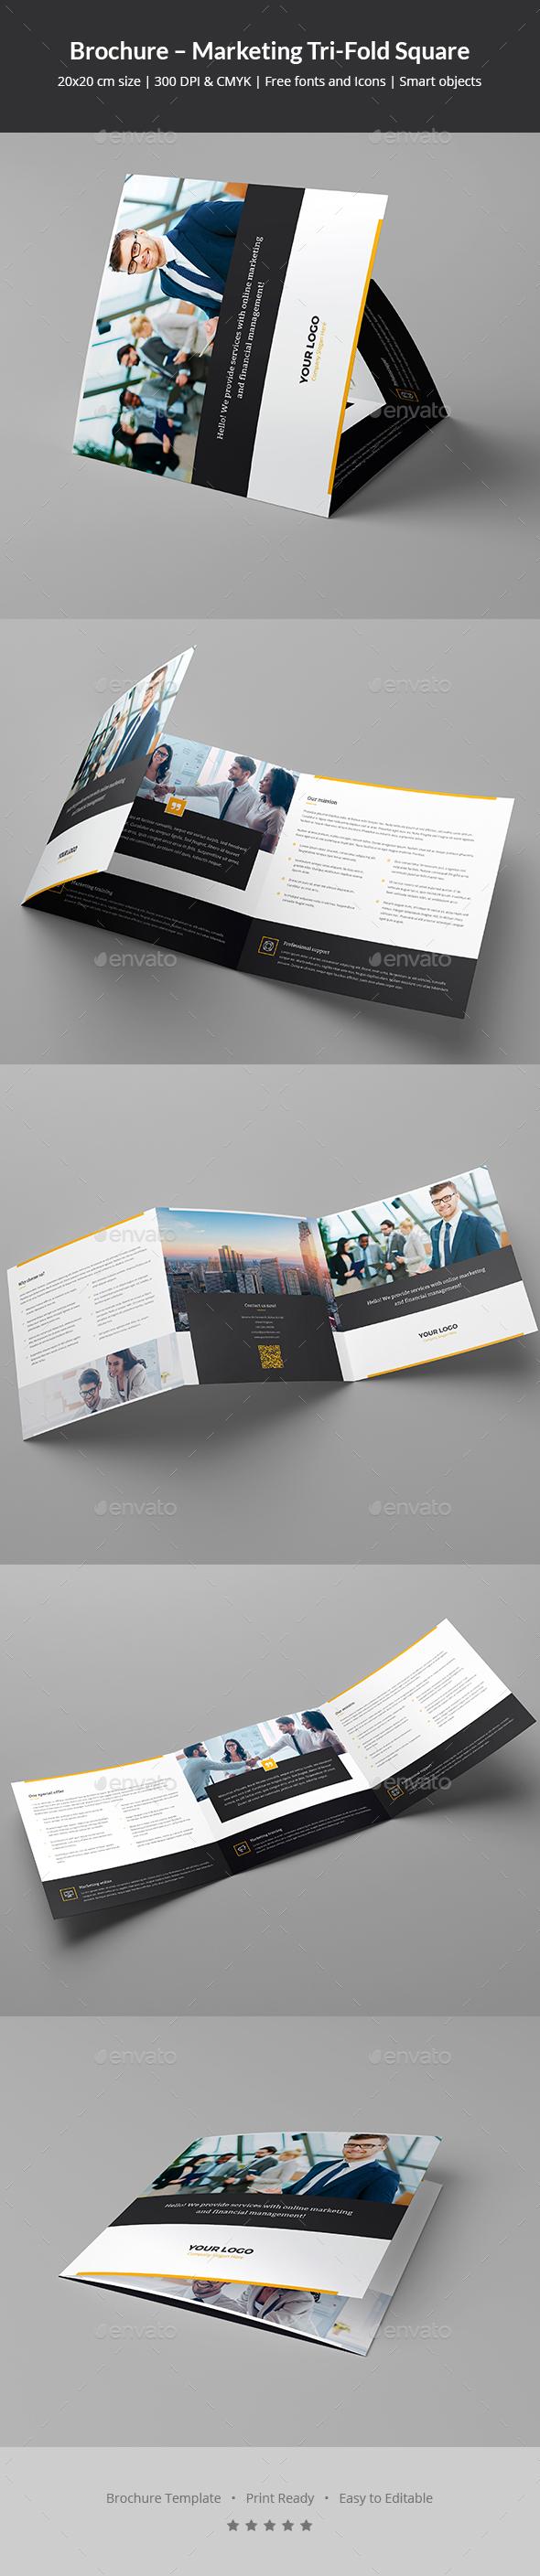 Brochure – Marketing Tri-Fold Square - Corporate Brochures